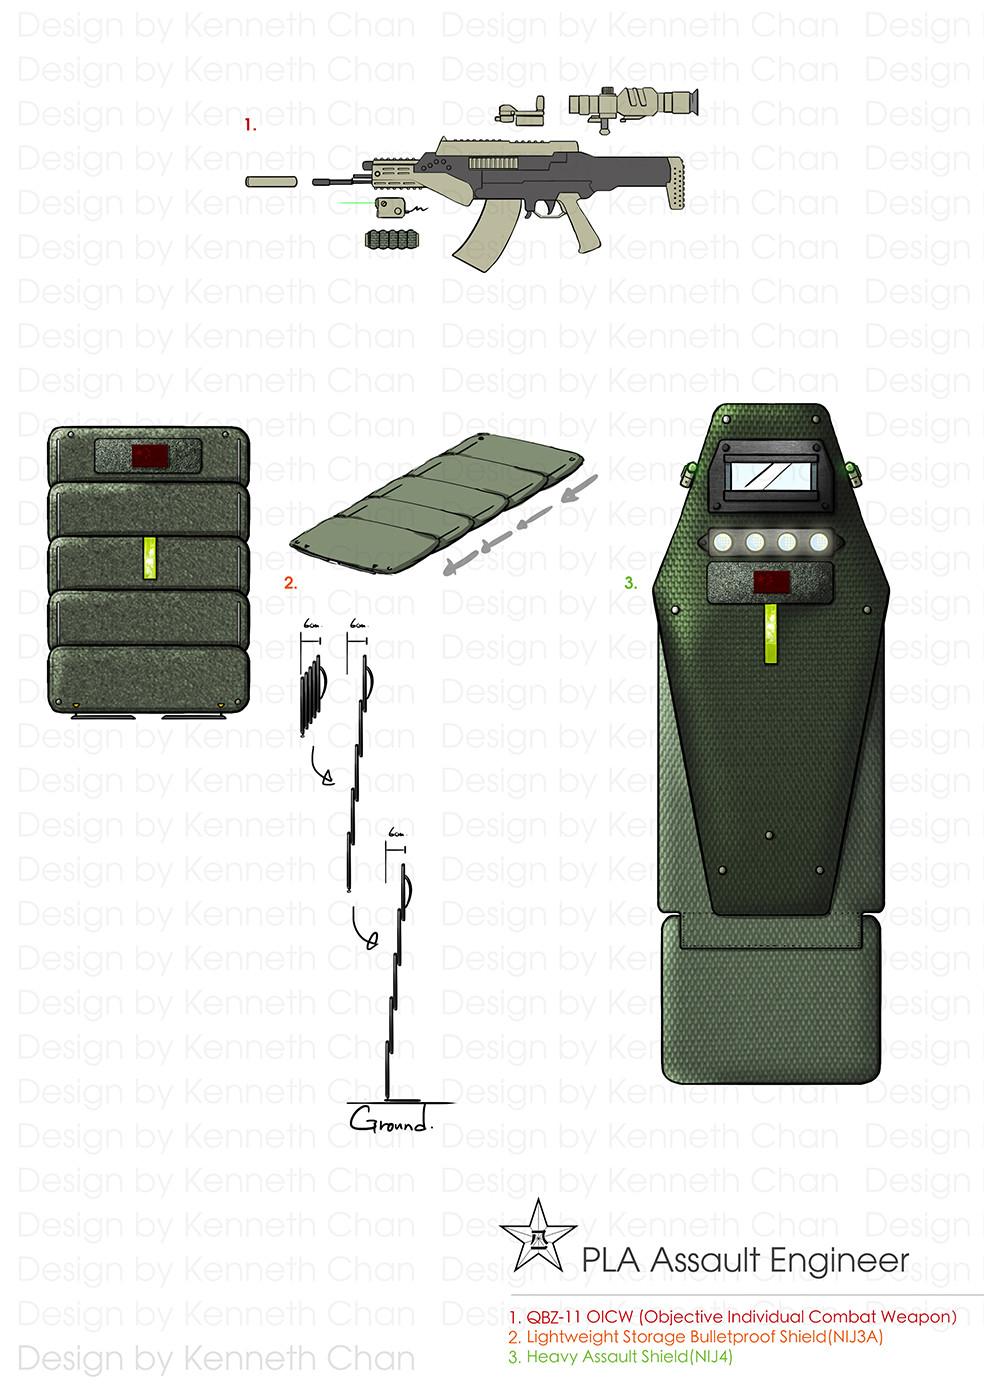 PLA Assault Engineers EOD Gear  Weapon & Shield